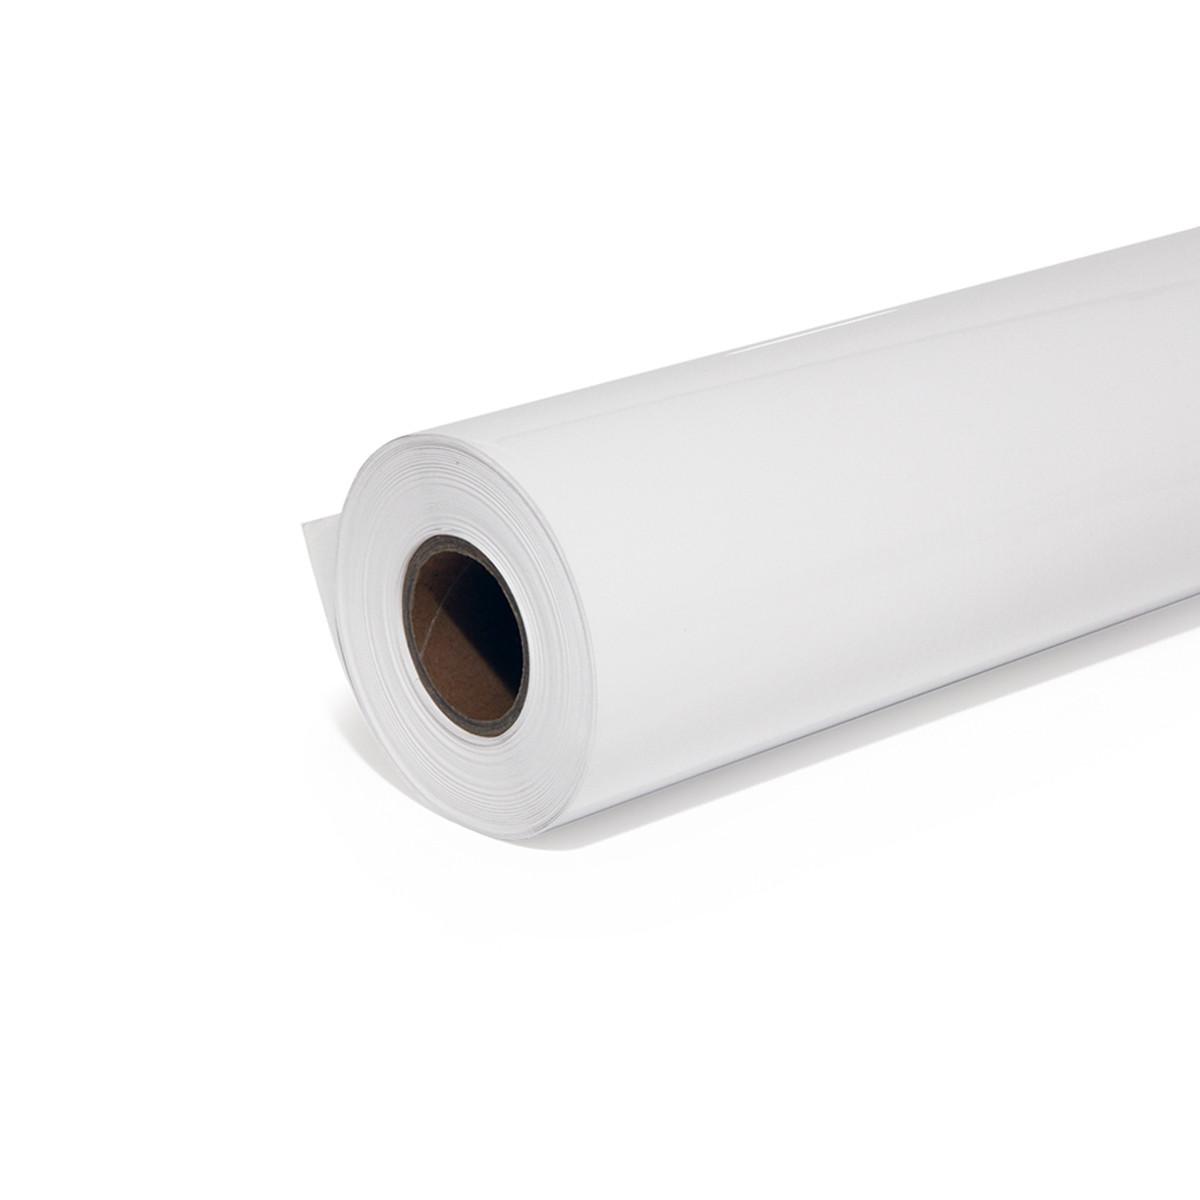 Papel para Plotter Sulfite | 75g Rolo 914MM x 50M